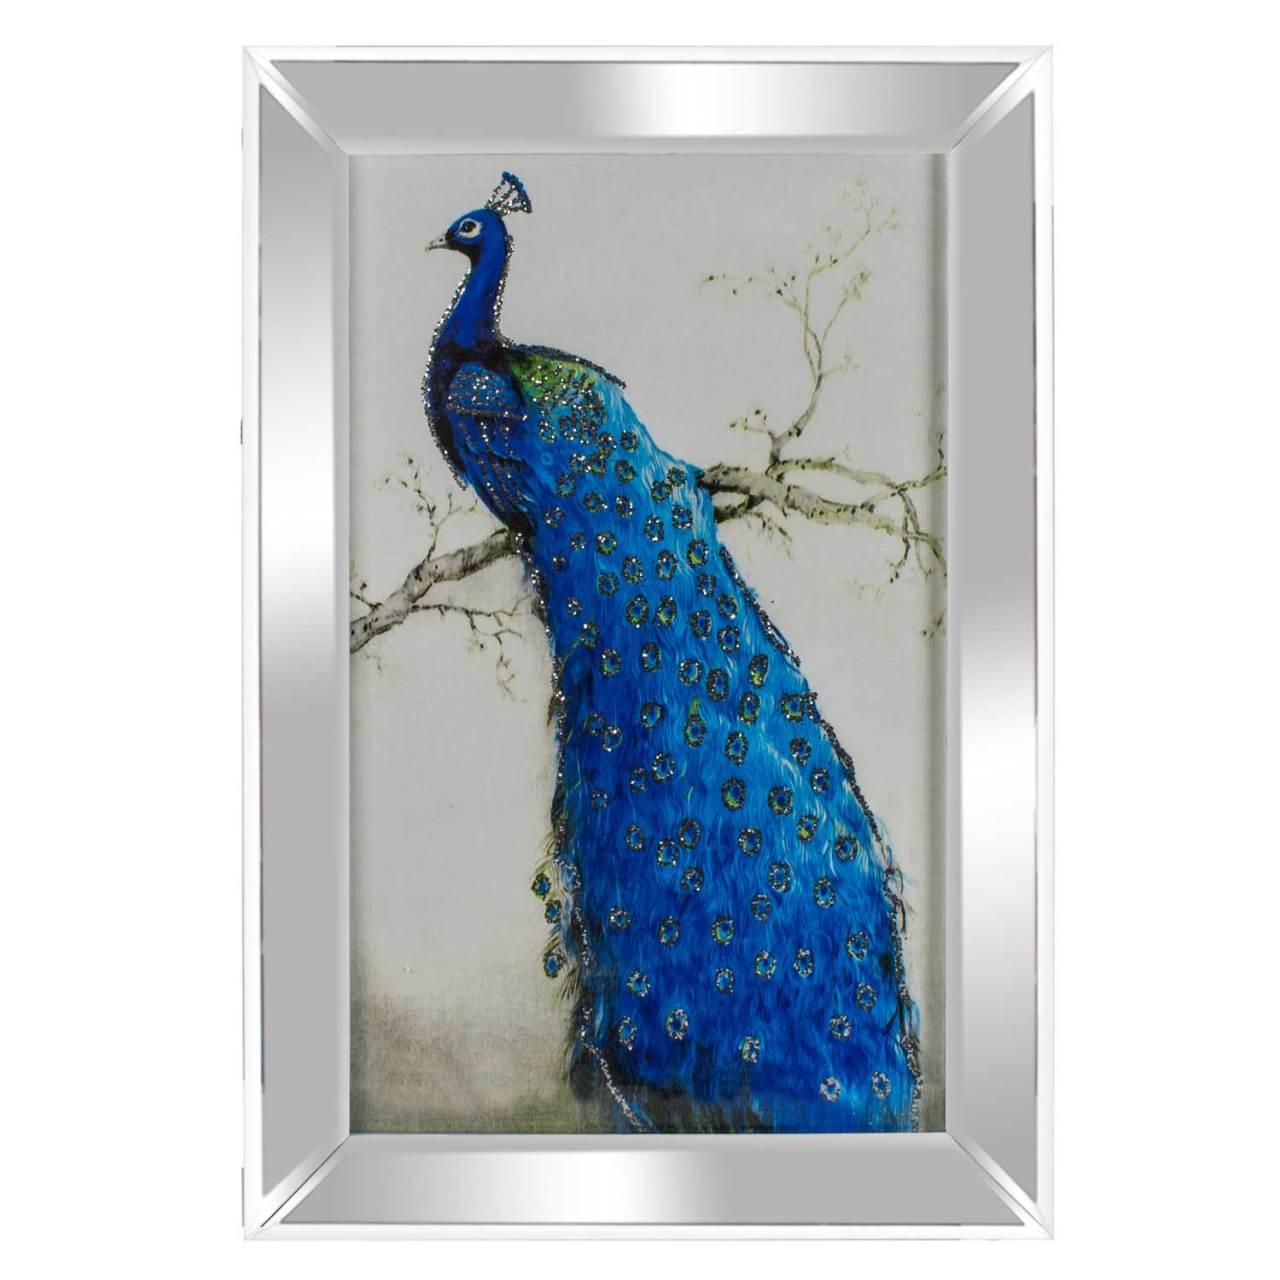 Euro Flora Ayna Cerceveli Tavus Kusu Tablosu 40x60 Cm Kanvas